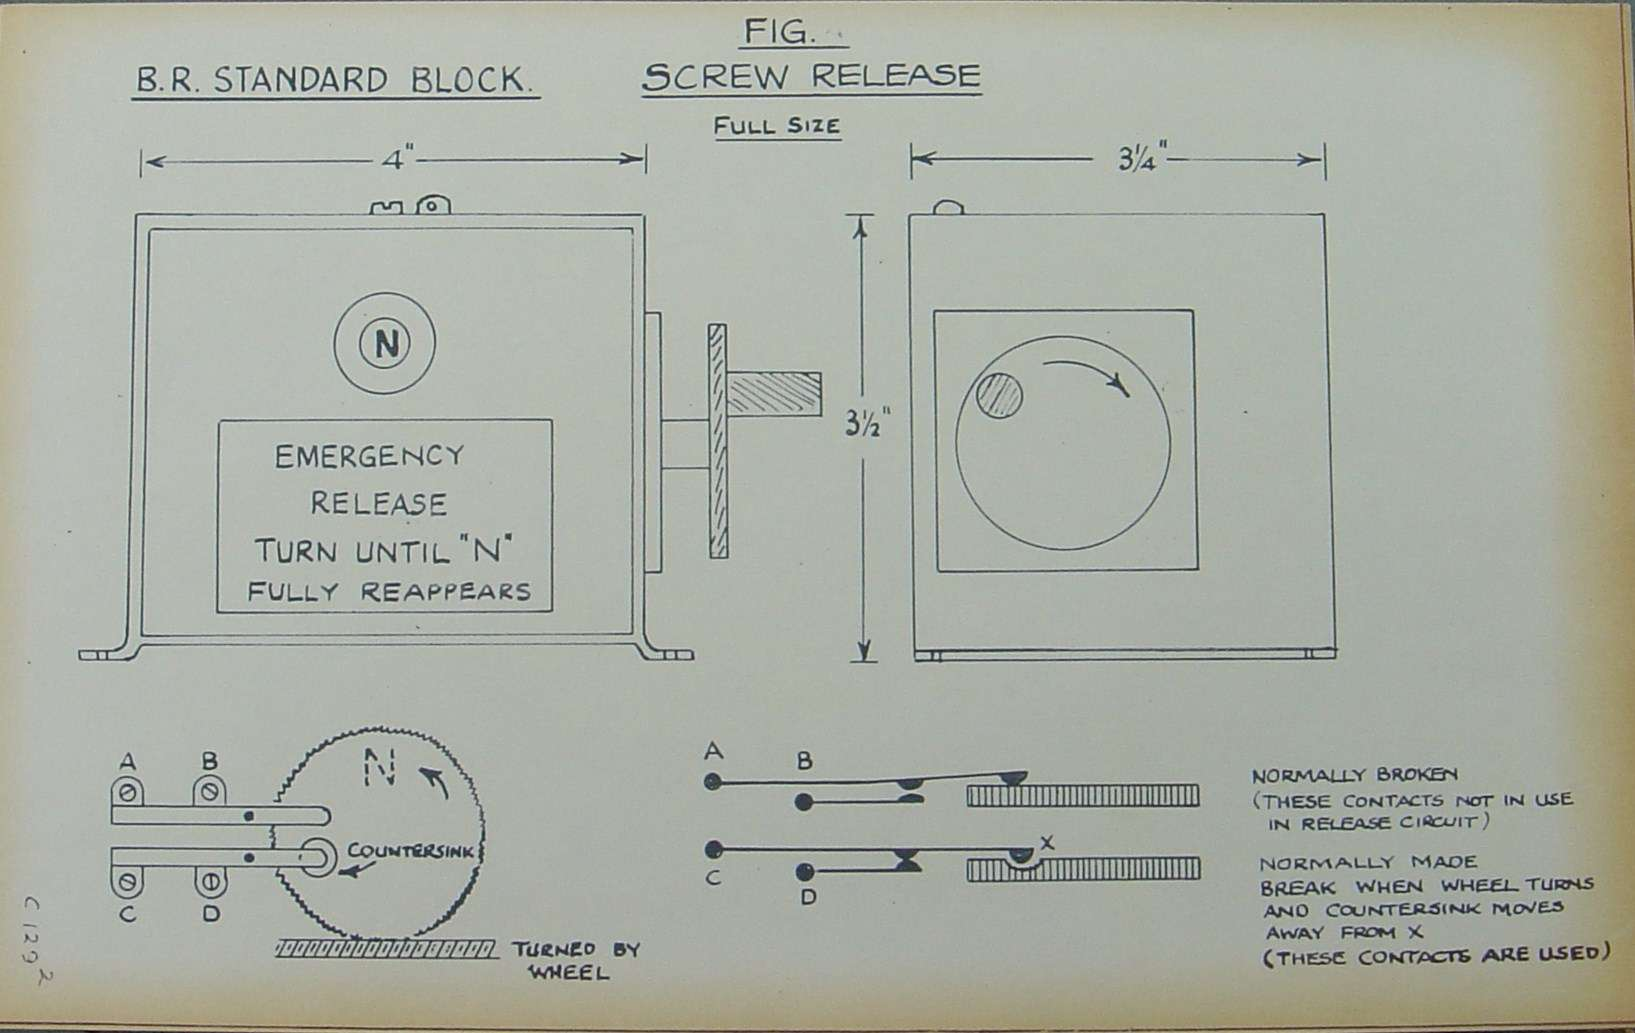 lner block instruments rh lymmobservatory net Ses Simplex Control S10020n1 Wiring Ses Simplex Control S10020n1 Wiring